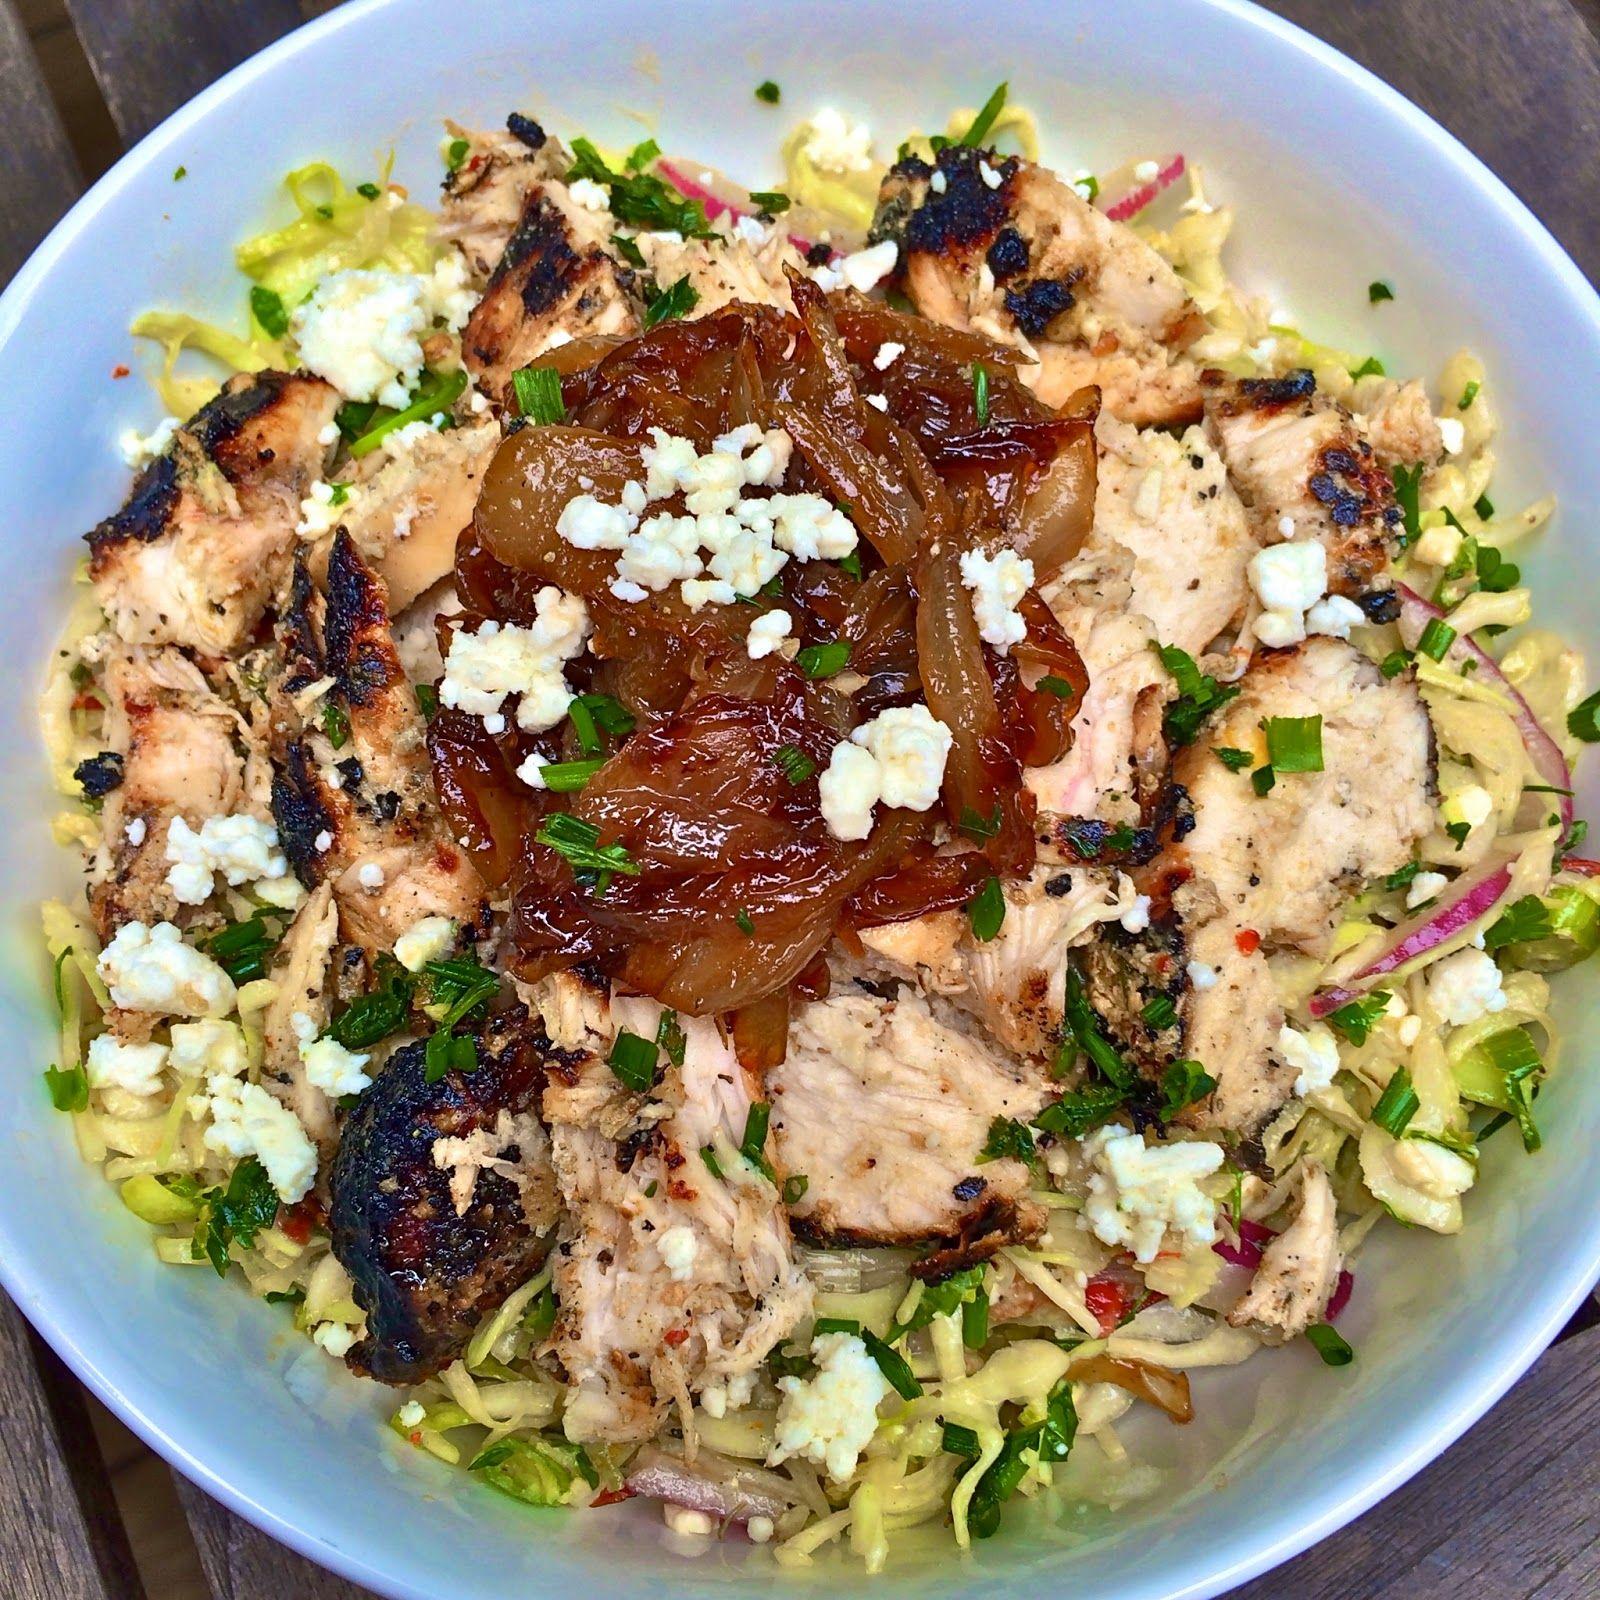 Copycat Recipe Zoe S Kitchen Protein Power Plate With Greek Yogurt Marinated Grilled Chicken Greek Fet Marinated Grilled Chicken Zoes Kitchen Copycat Recipes